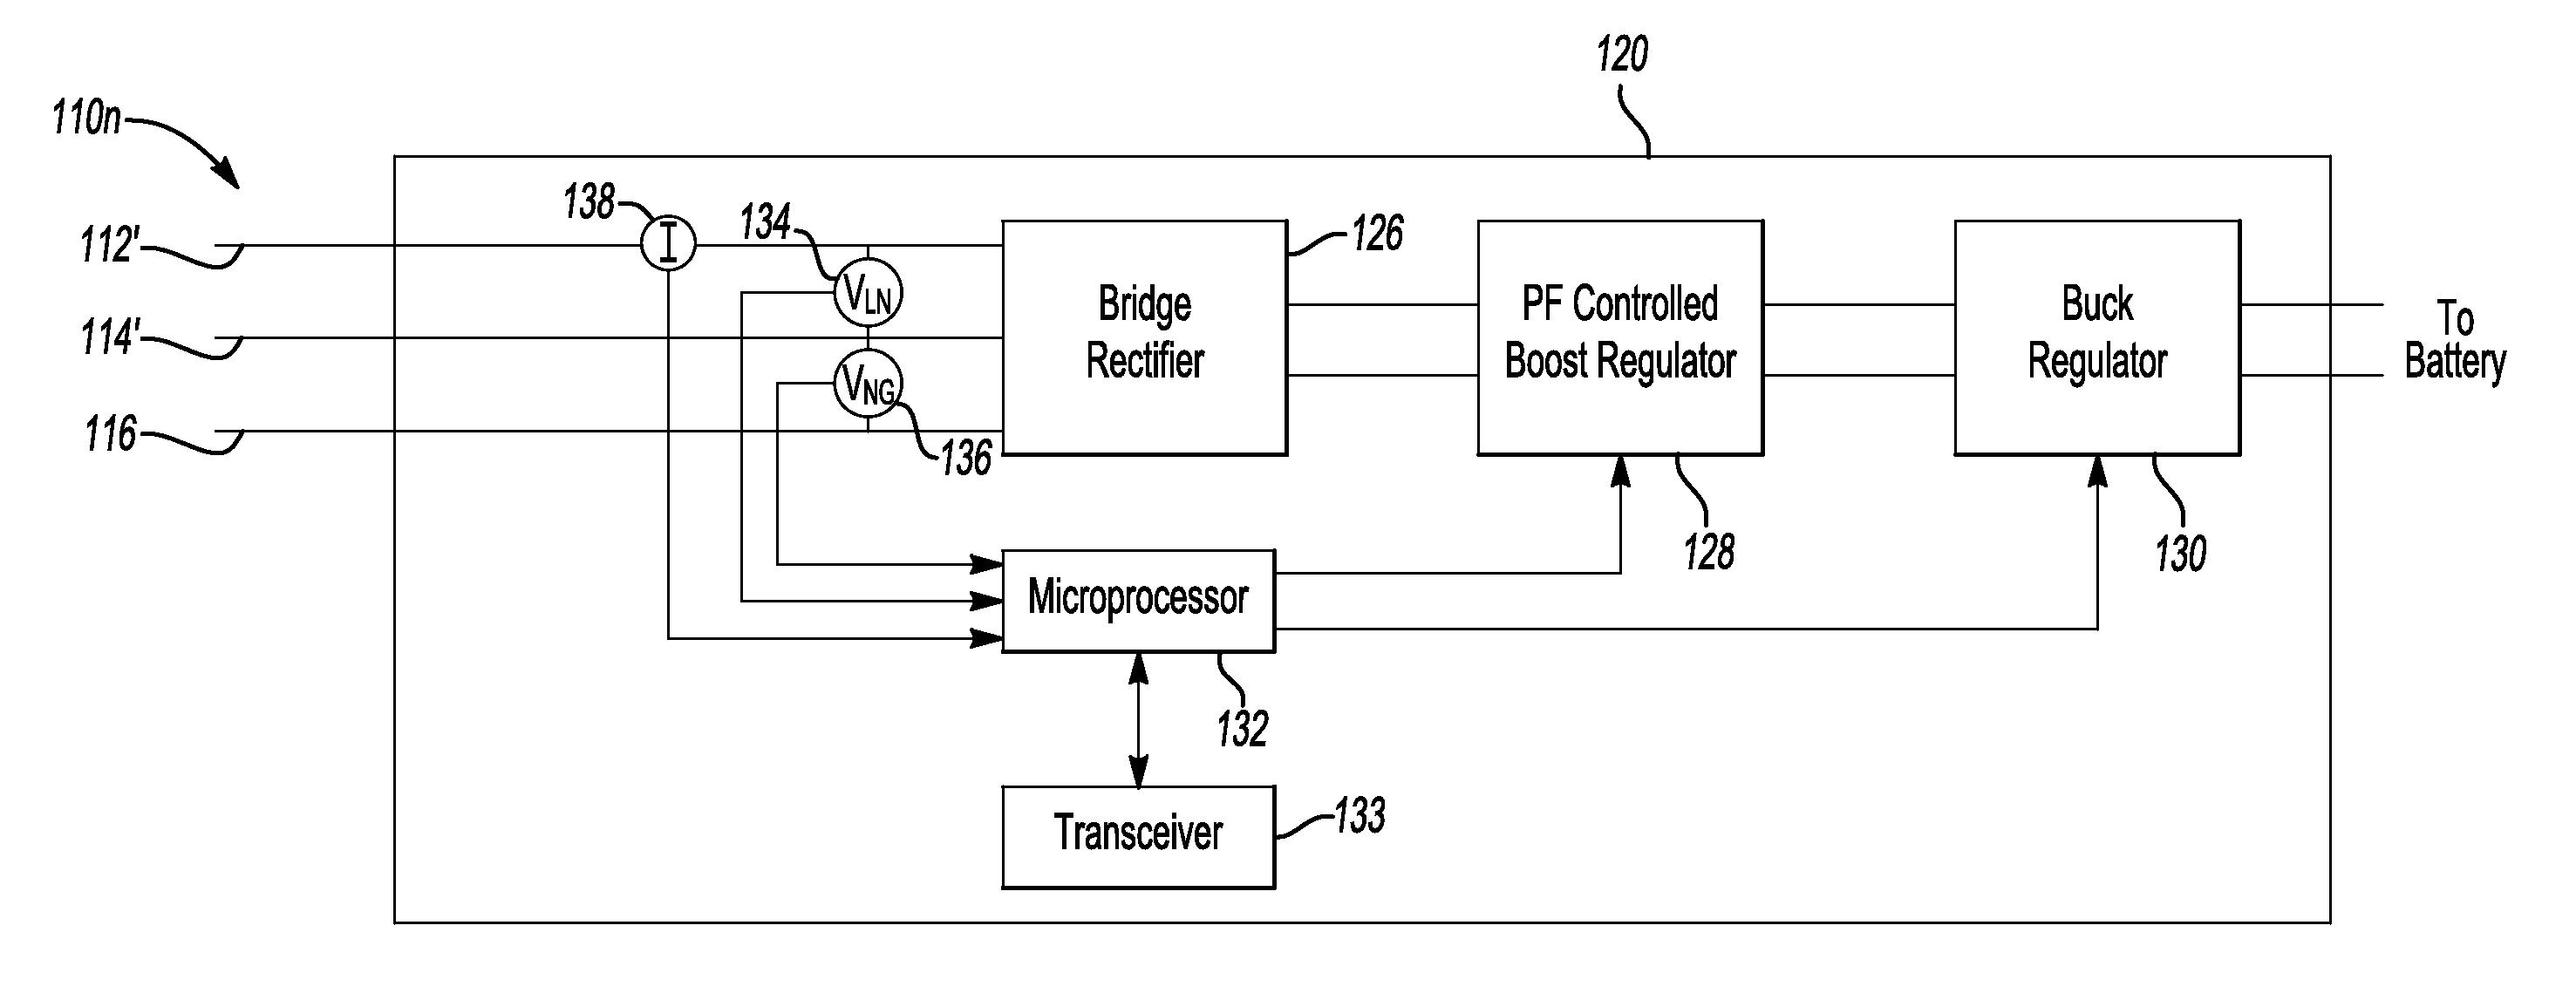 twister hammerhead 150 wiring diagram 2 way switch besides harness get